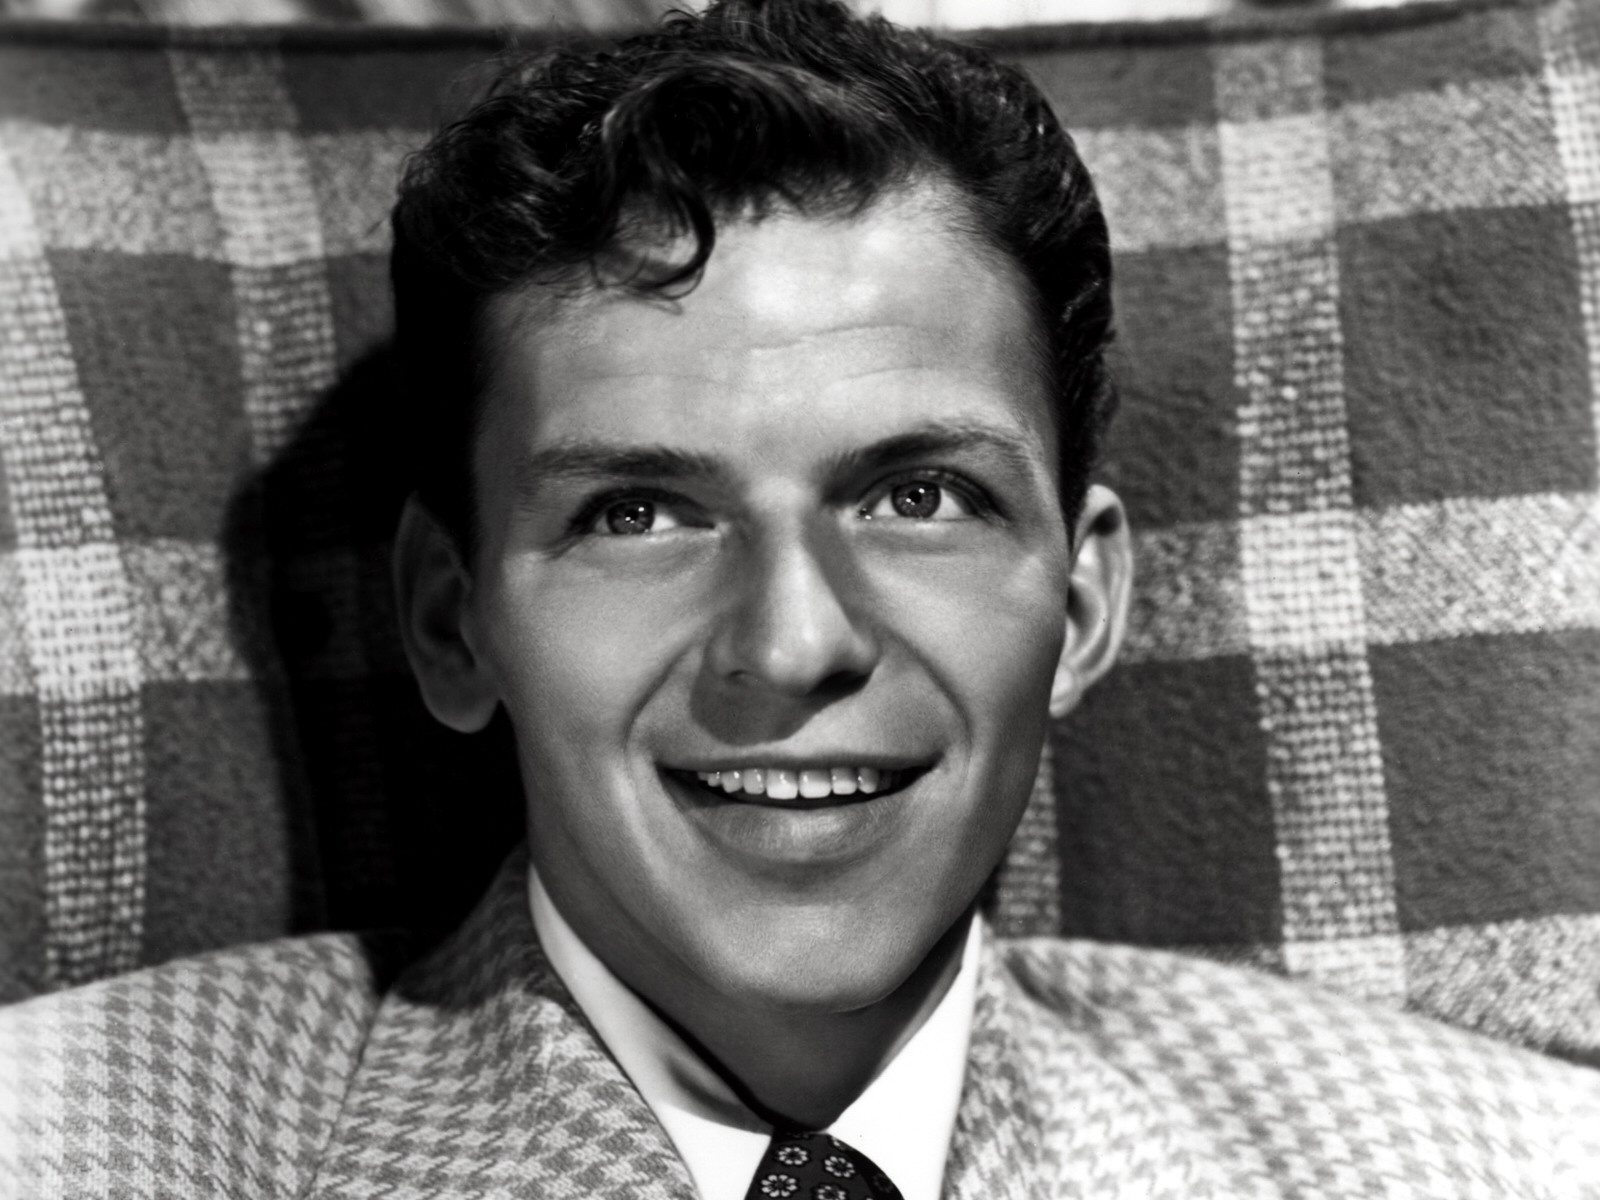 Mourner's Lane - Frank Sinatra Memories